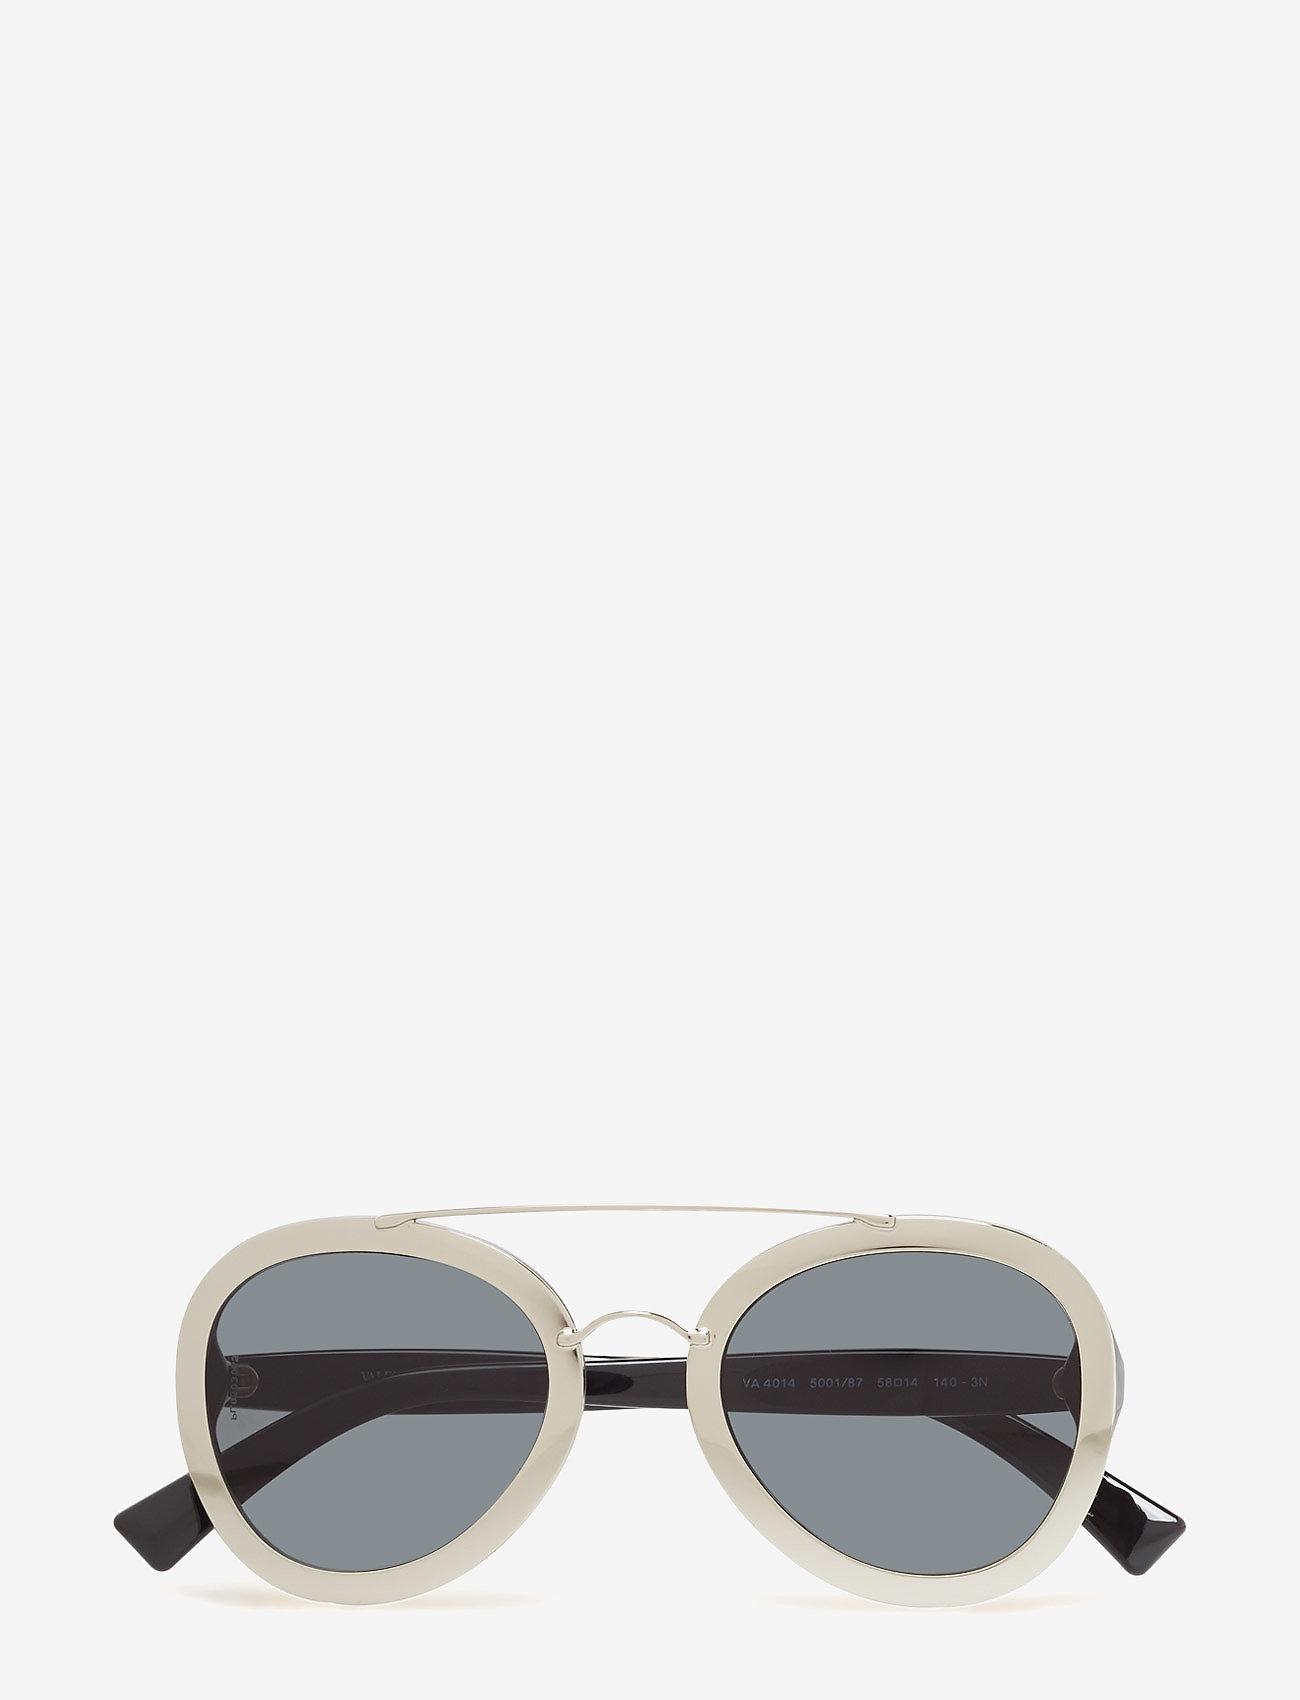 Valentino Sunglasses - ROCKER - round frame - silver - 0